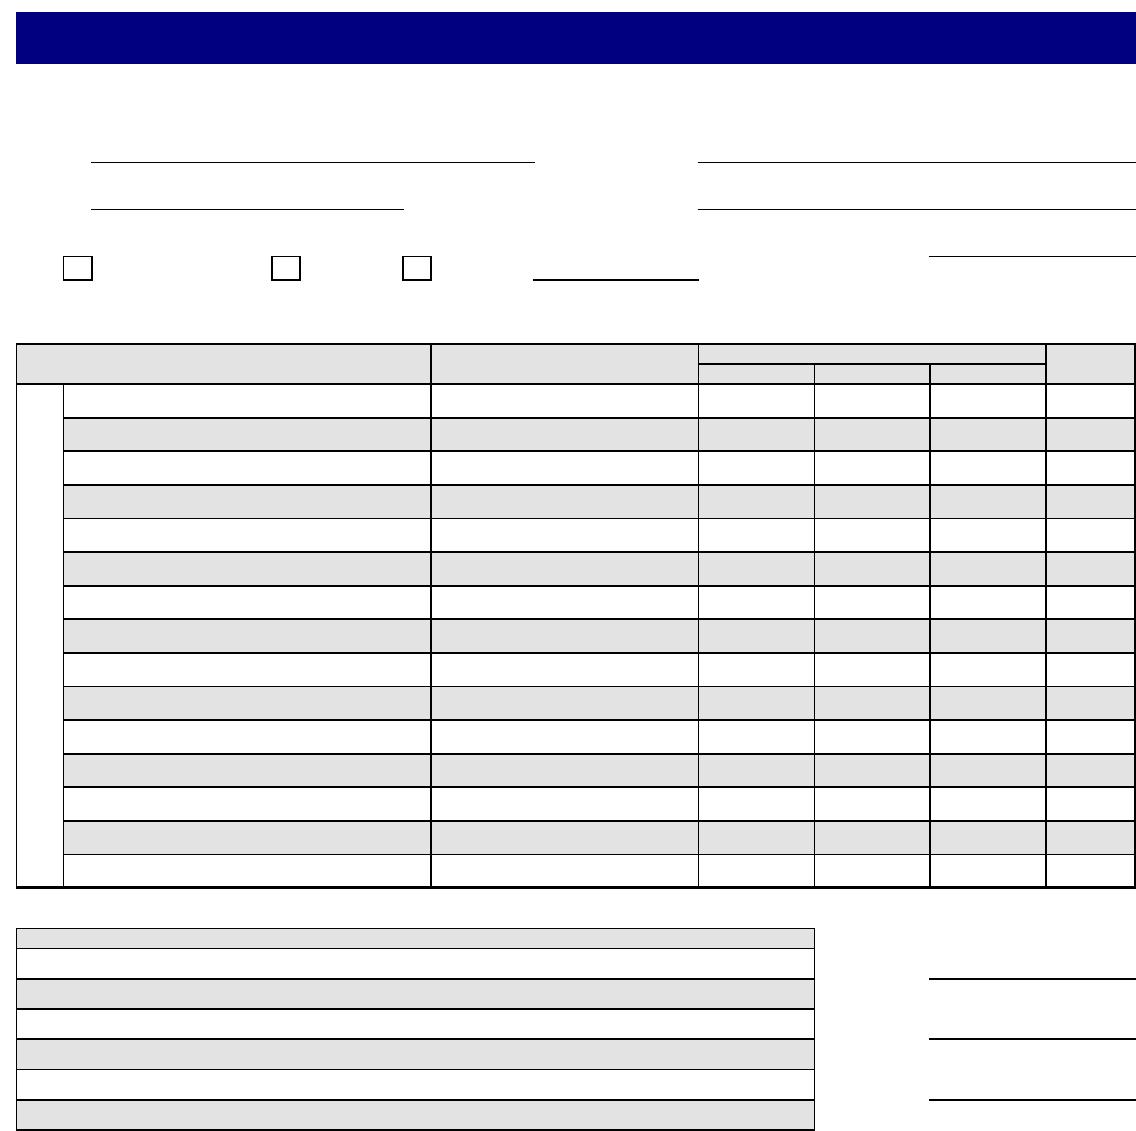 free daily time sheet xlsx 41kb 1 page s